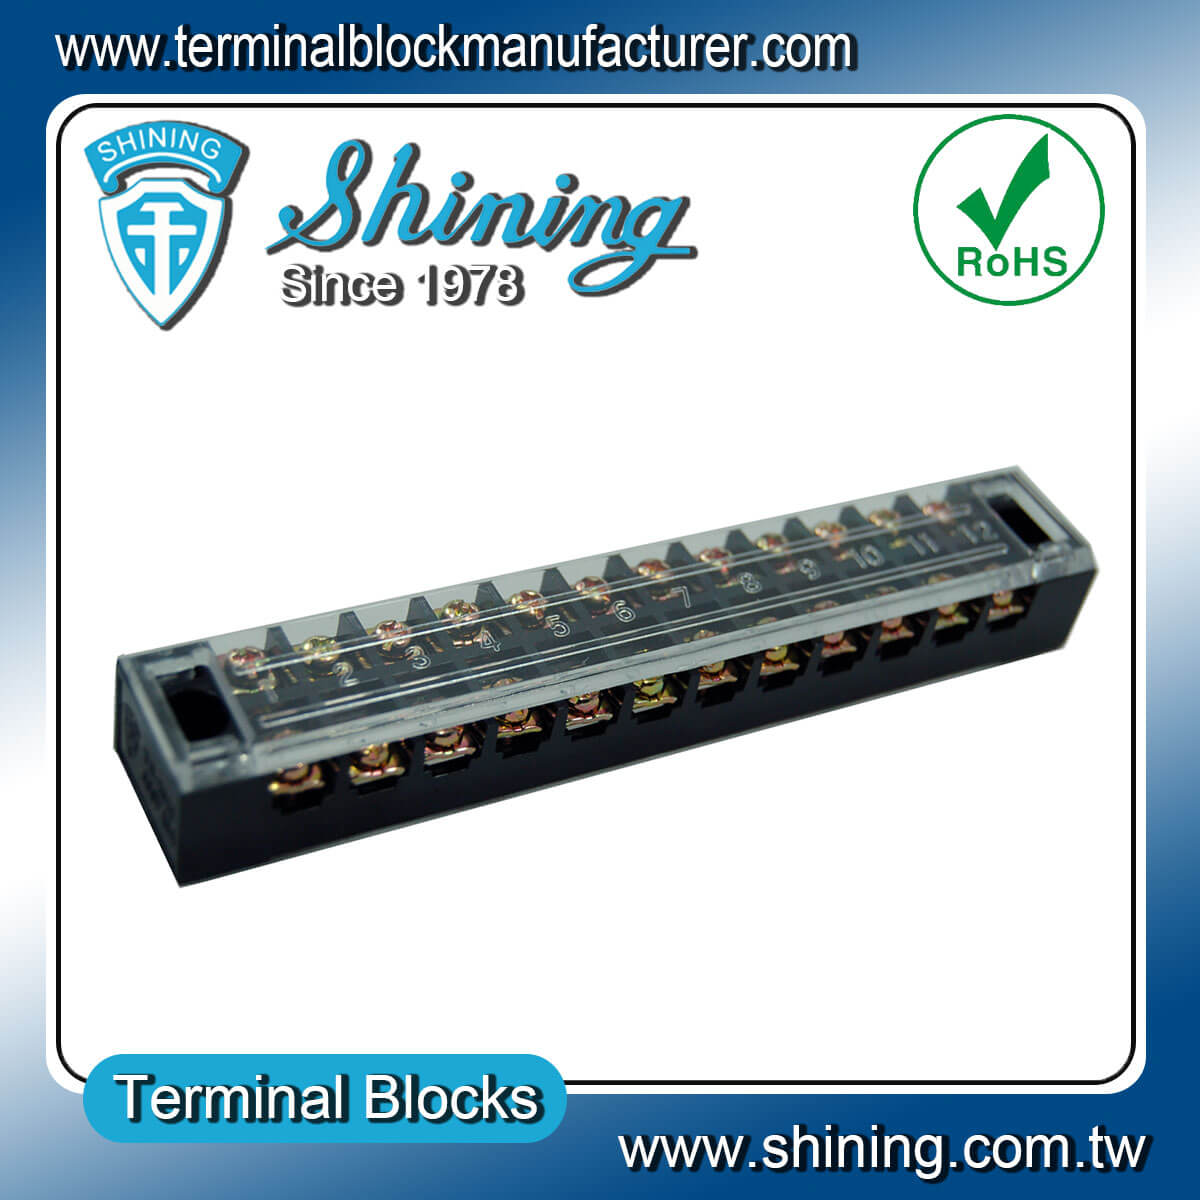 TB-2512L 600V 25A 12Pole固定式柵欄端子台